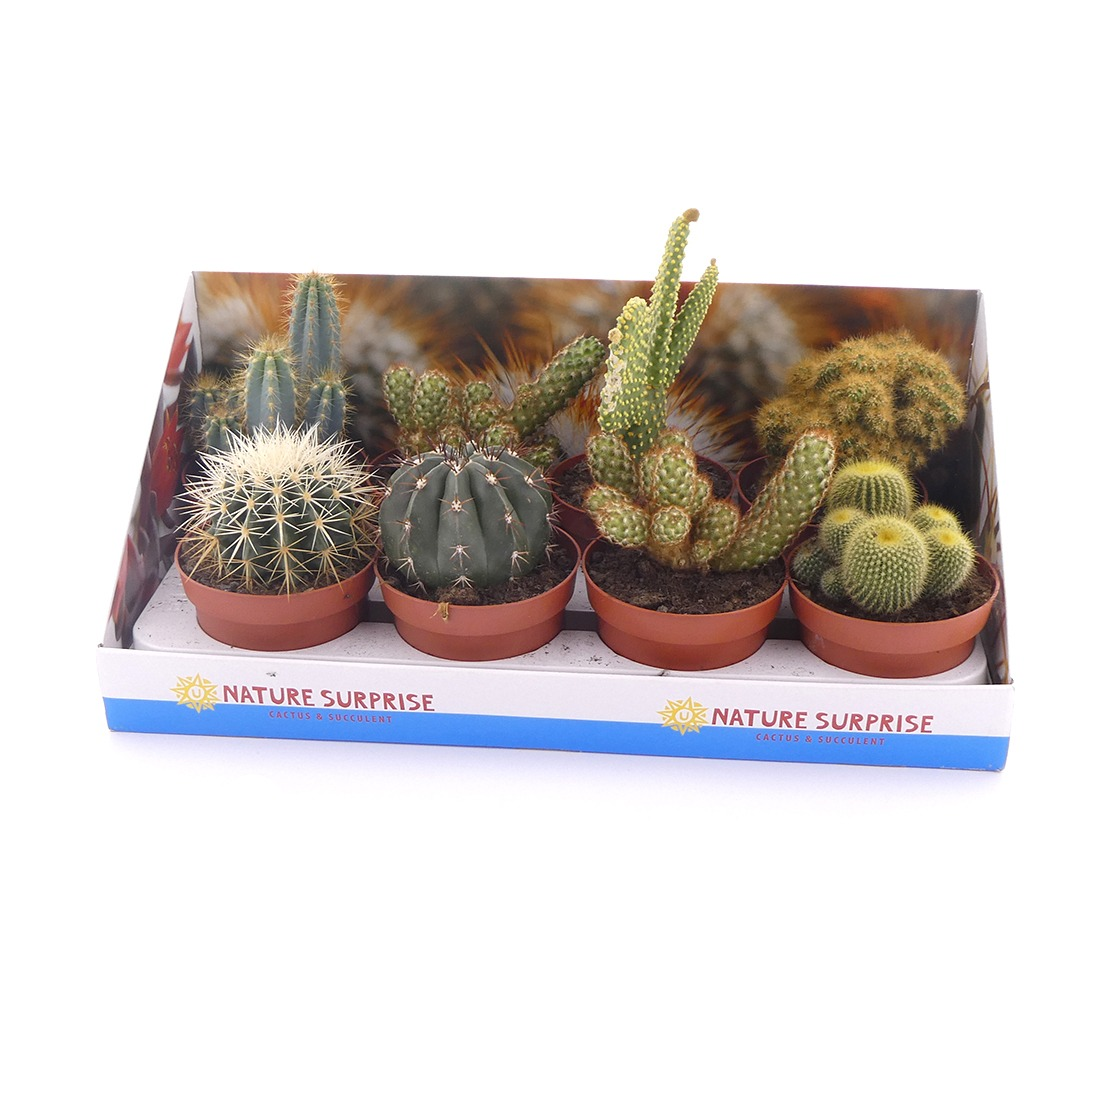 Productfotografie fotostudio planten cactus